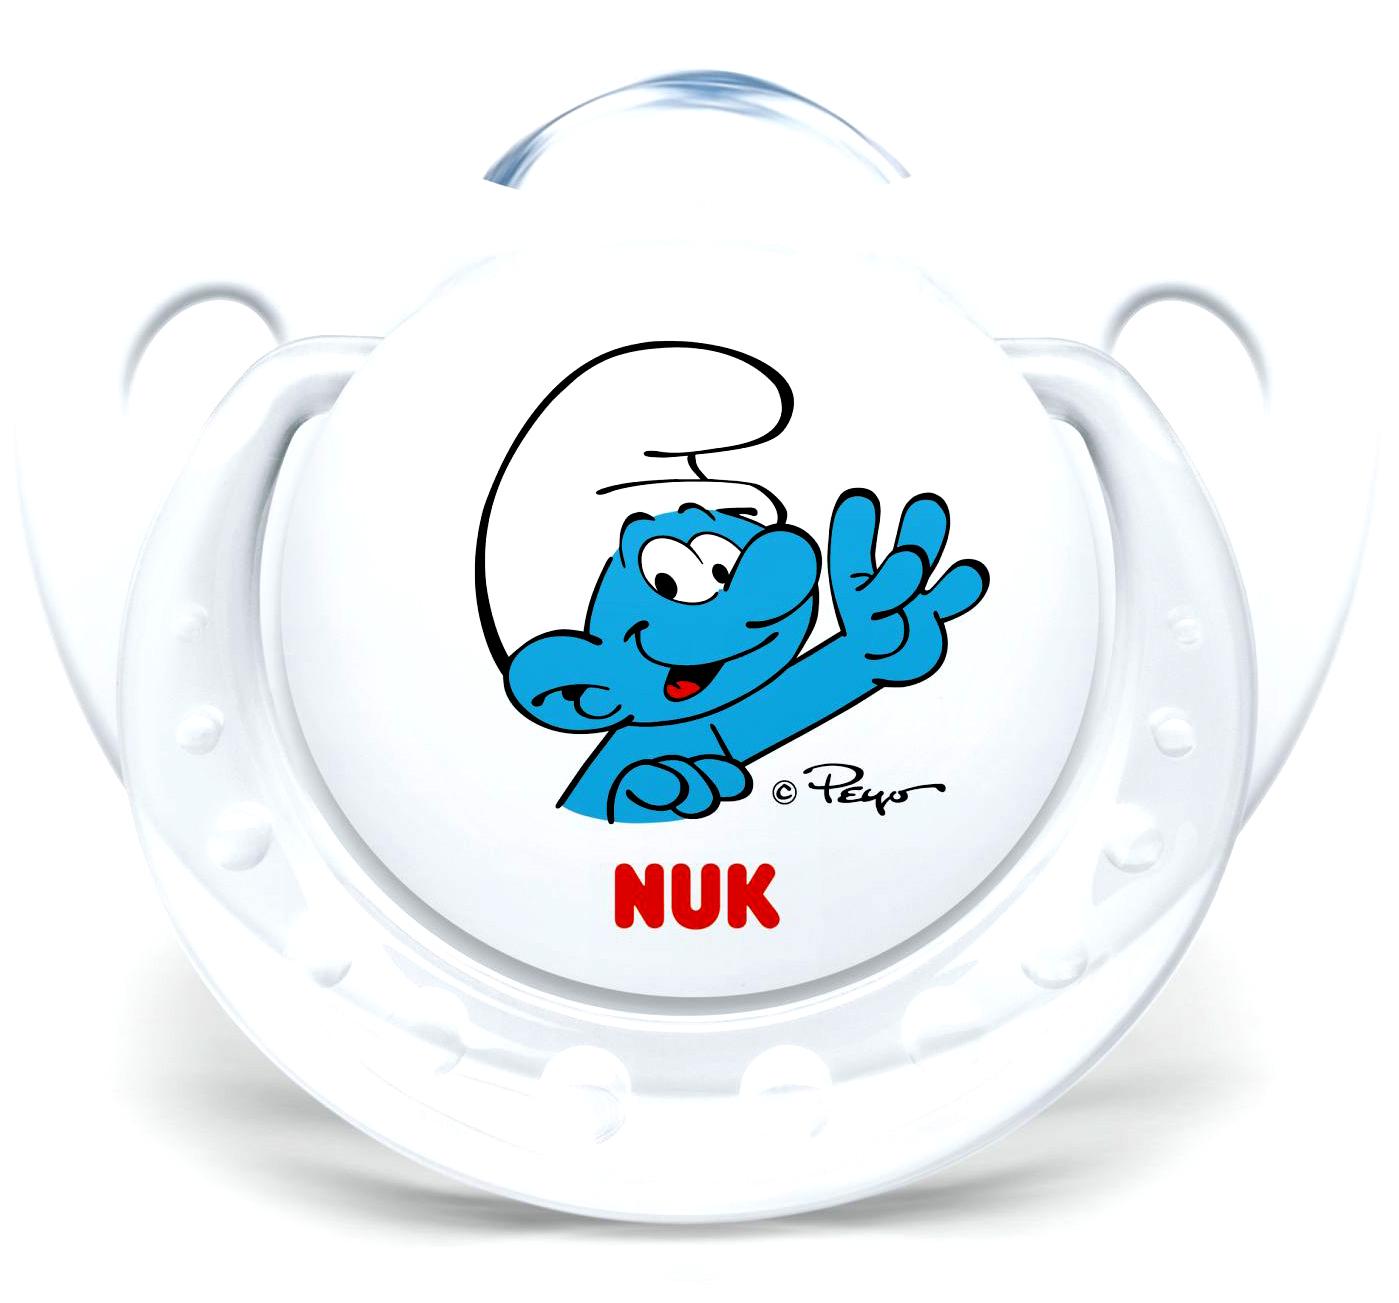 Nuk Trendline The SmurfsΠιπίλα Σιλικόνης με Κρίκο Χωρίς BPA σε Λευκό Χρώμα – Μέγεθος 1 (0-6 μηνών)